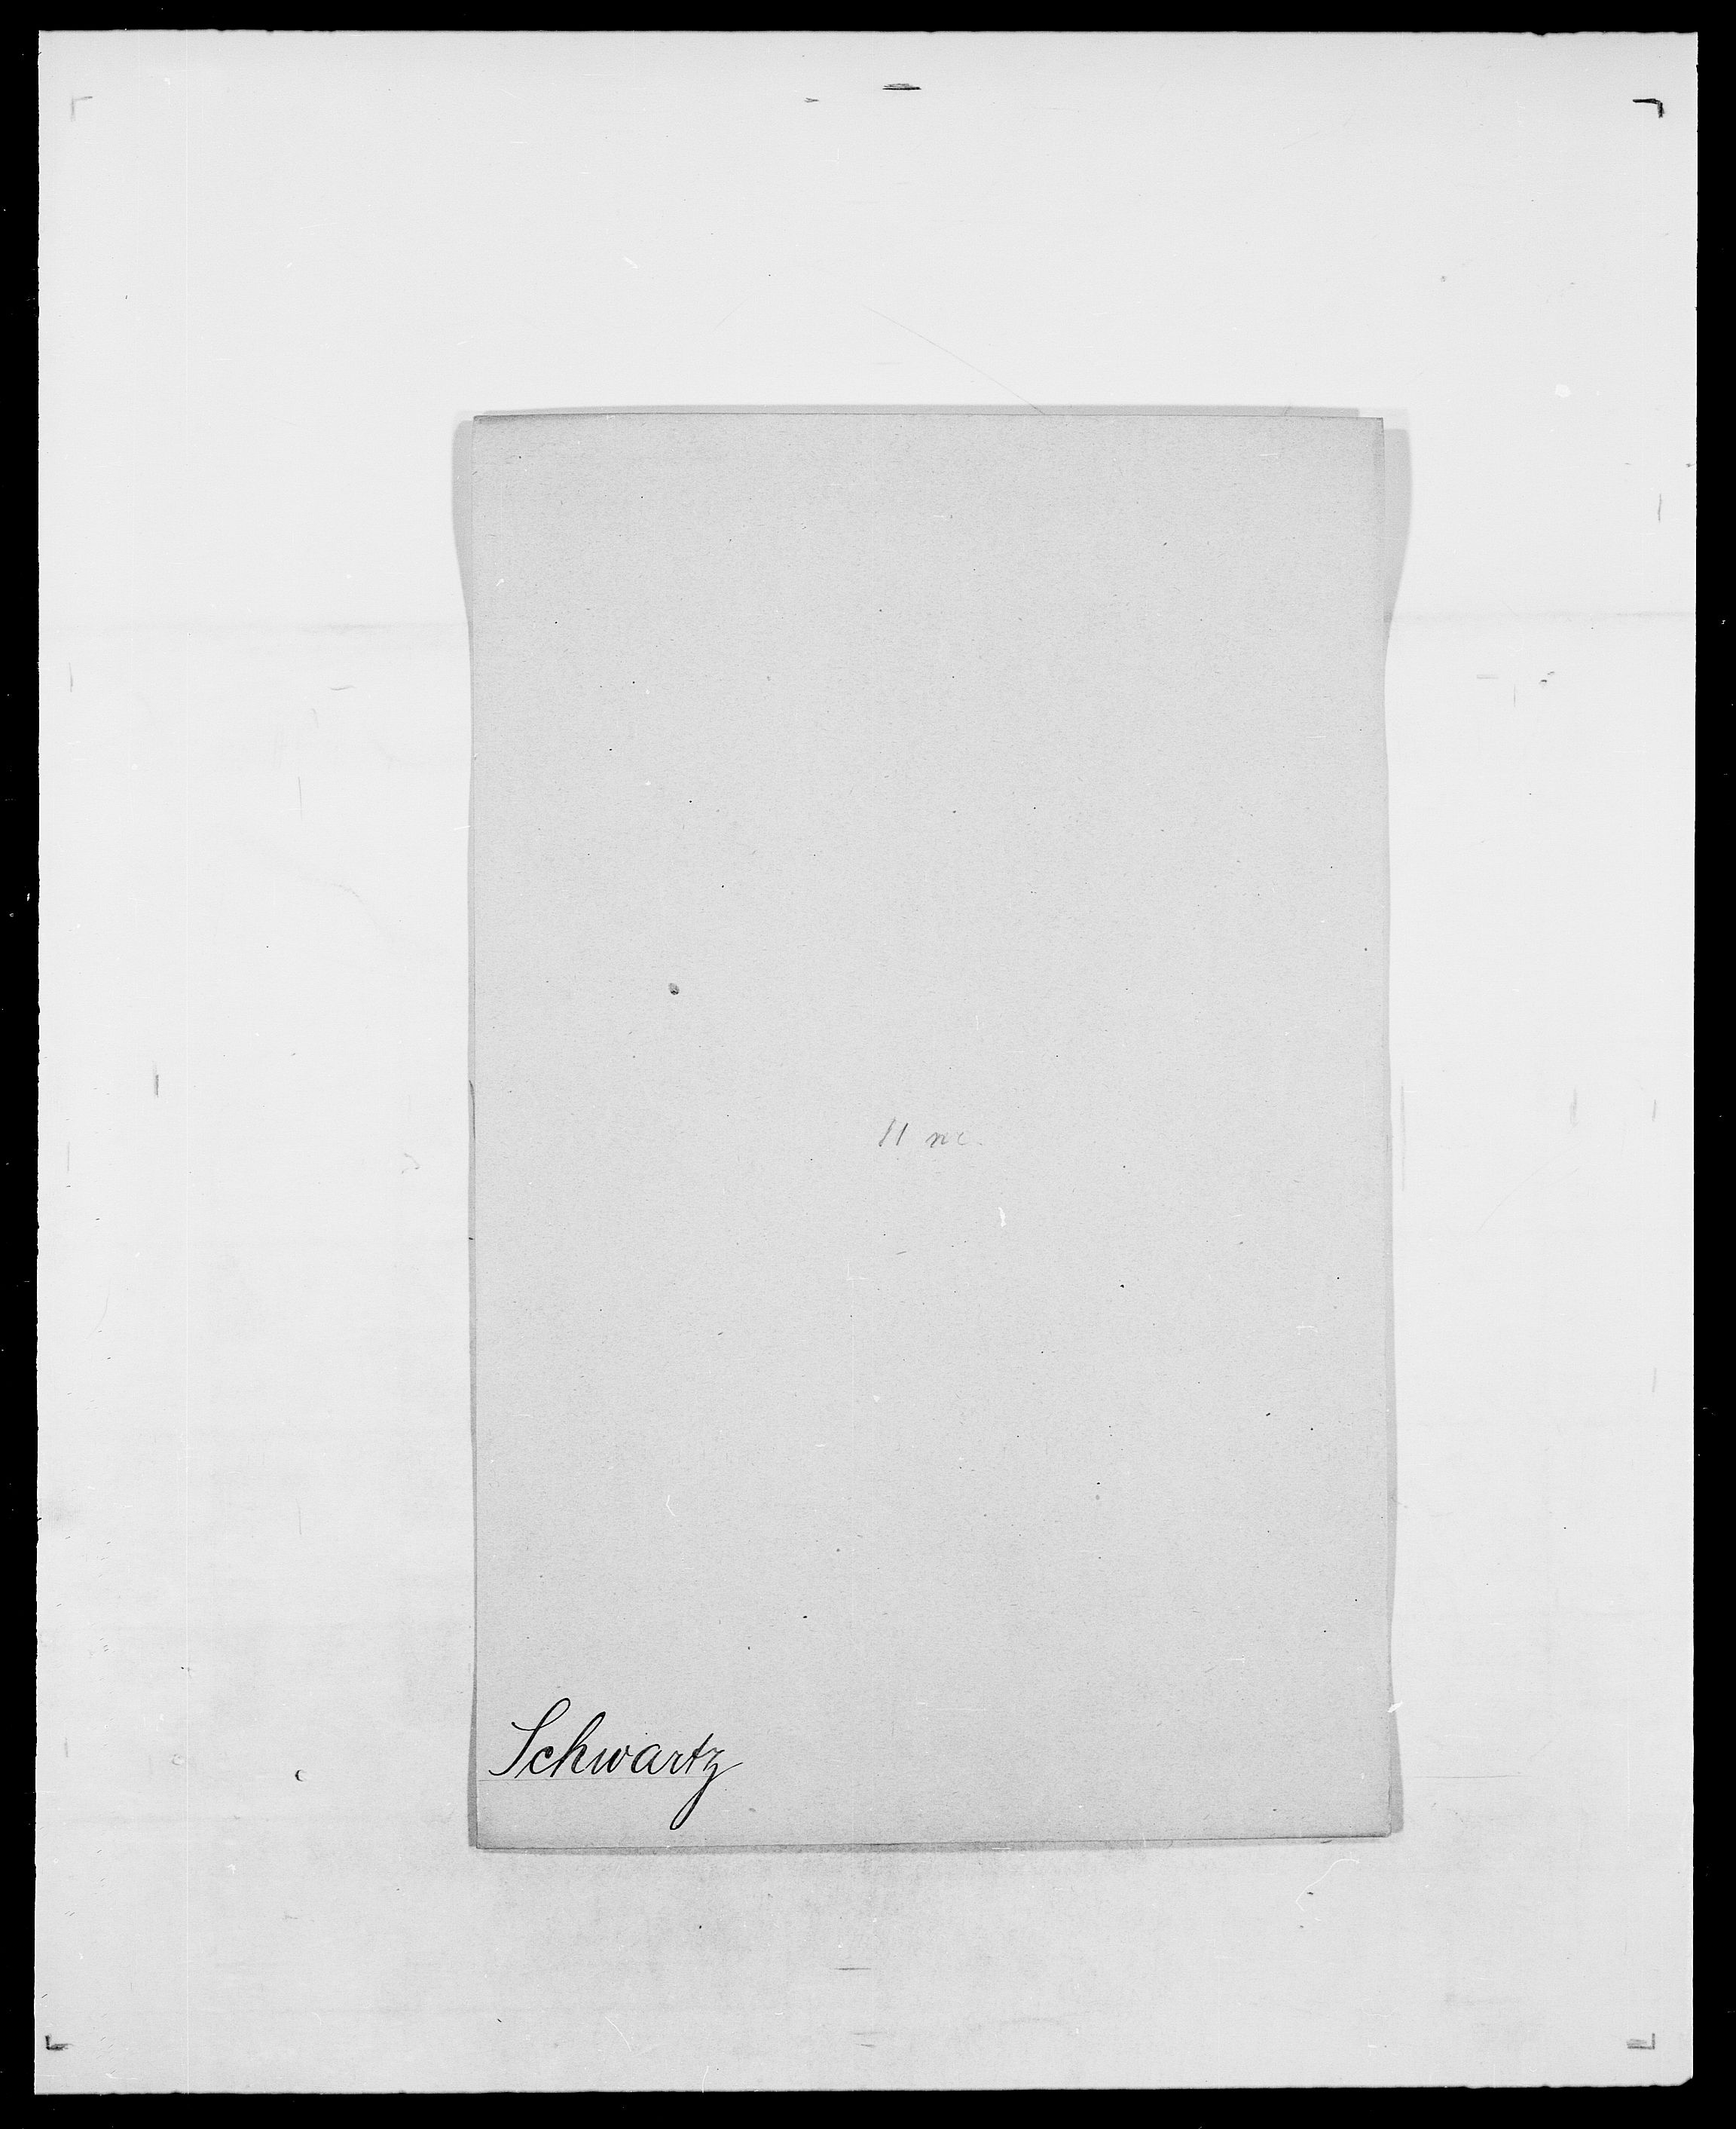 SAO, Delgobe, Charles Antoine - samling, D/Da/L0035: Schnabel - sjetman, s. 374